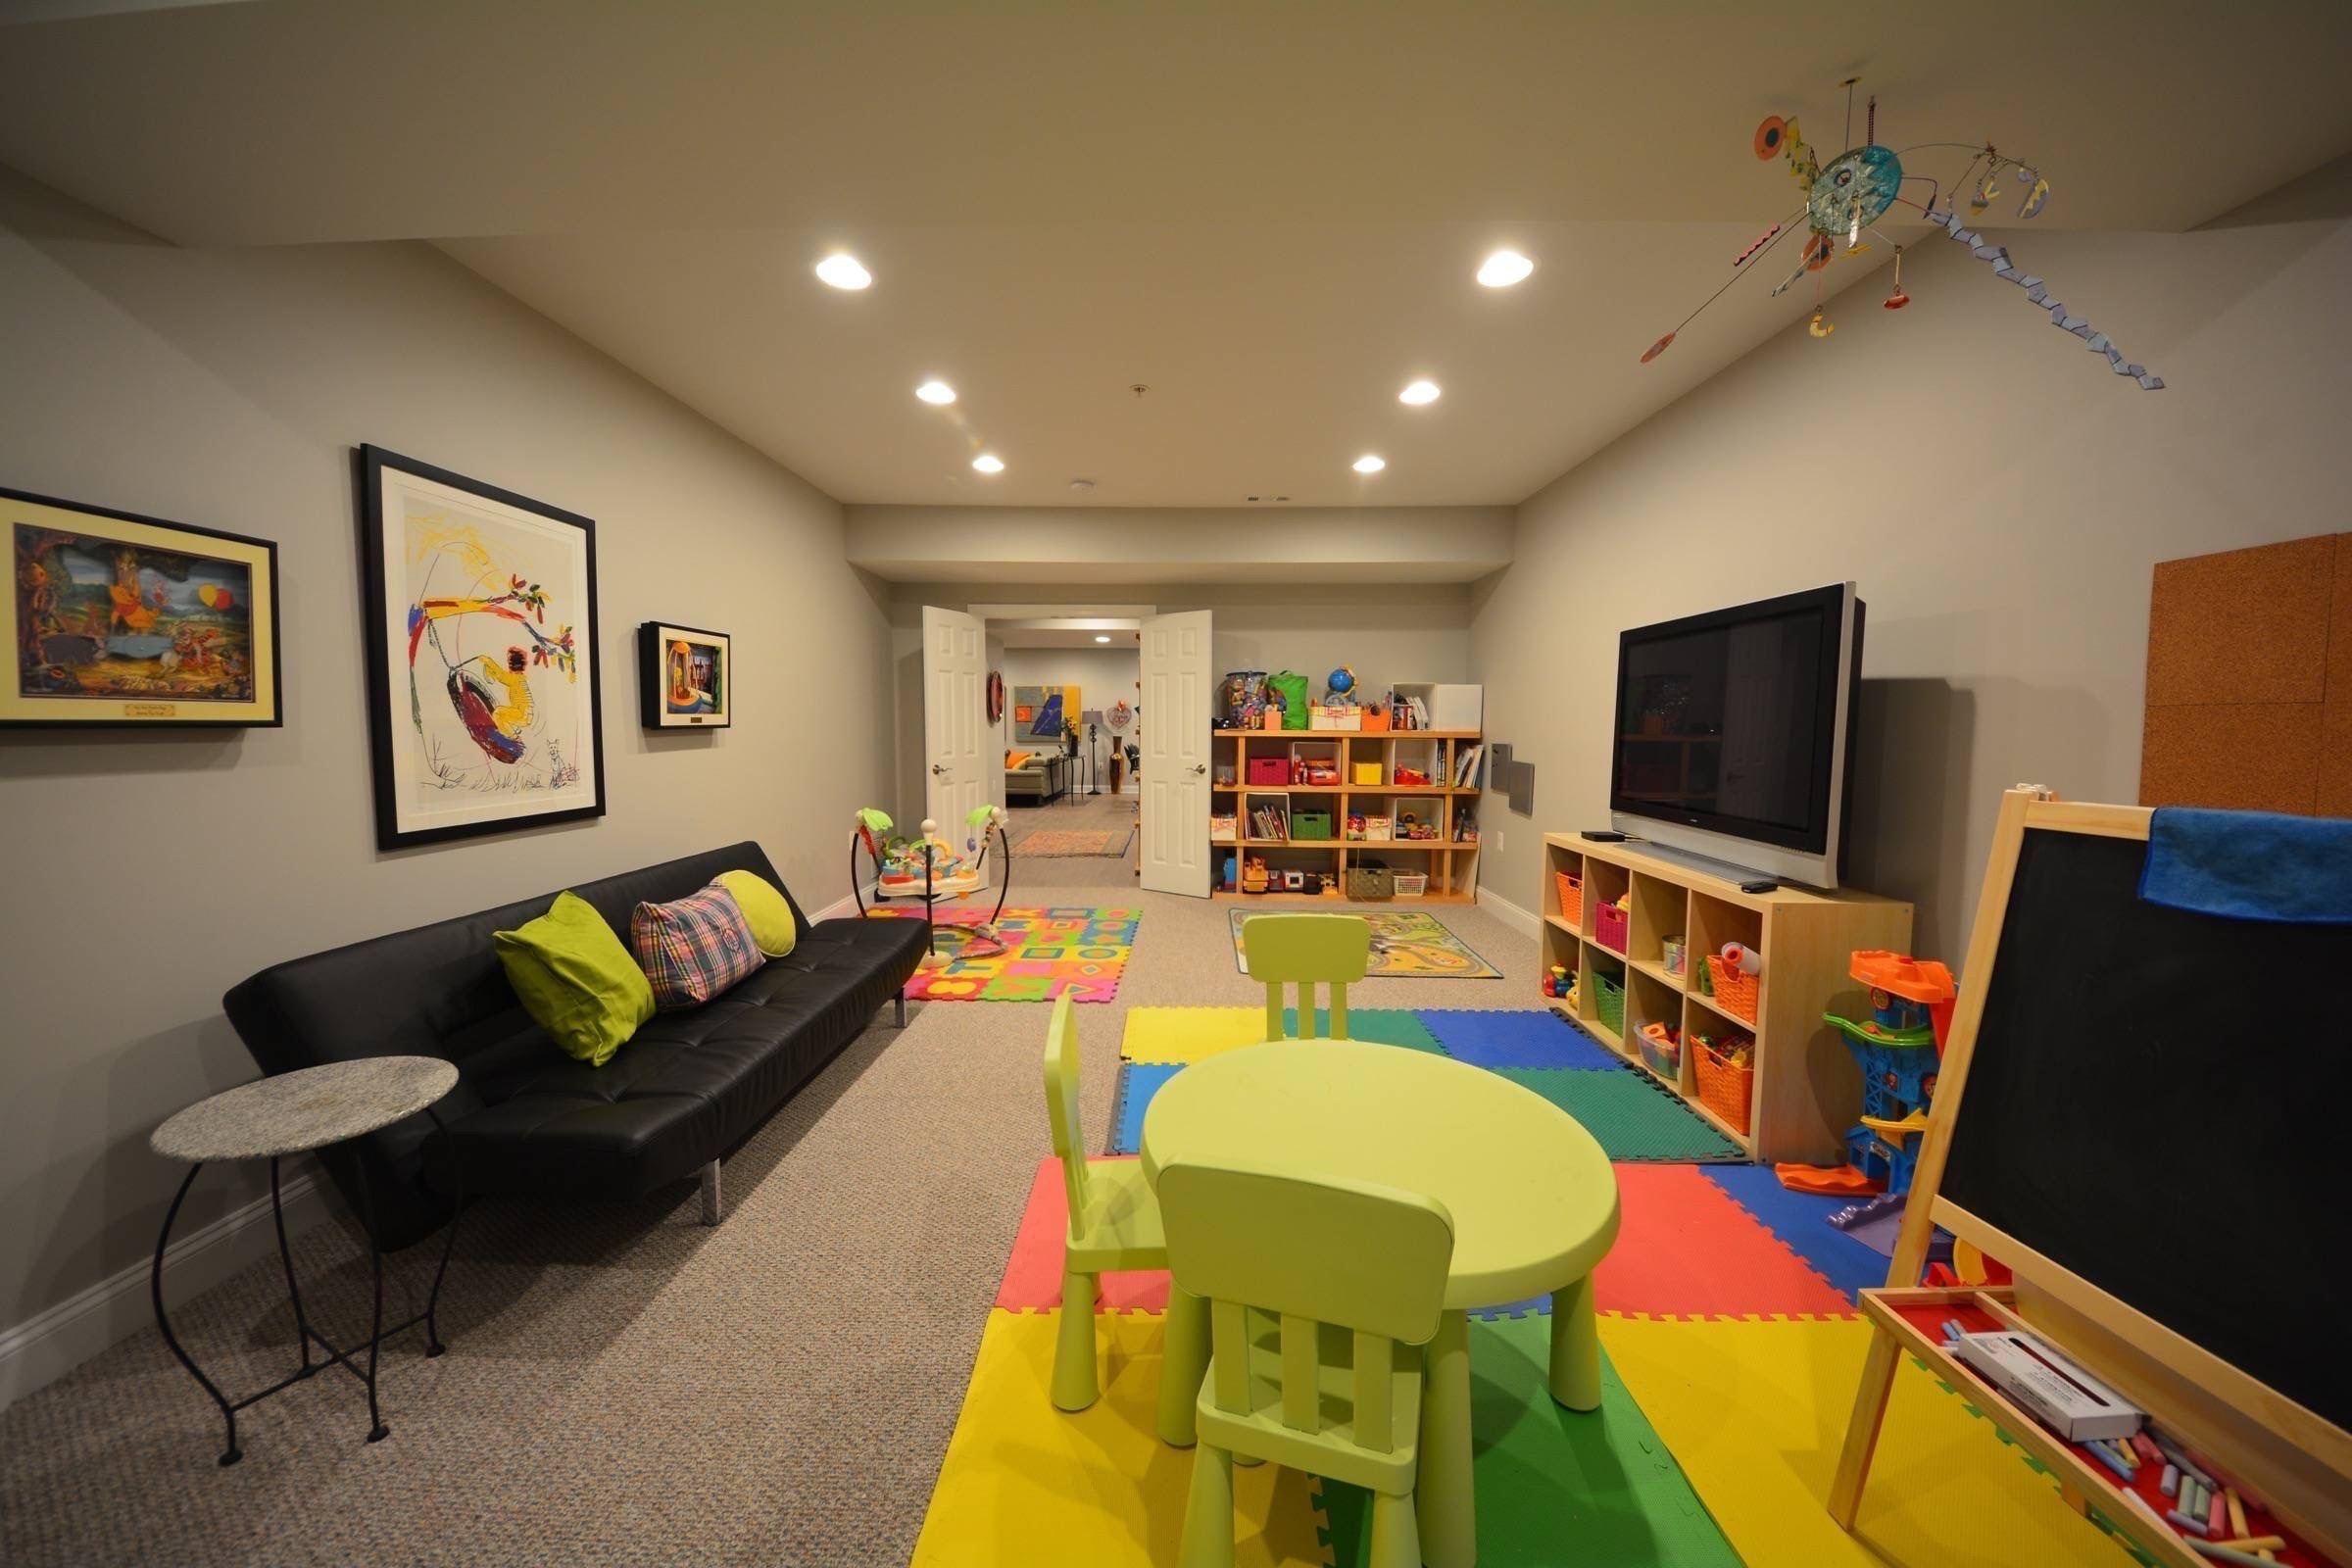 Hot Kids Basement Playroom Ideas Design To Basement Plus Best 19 Kids  Playroom Ideas For Every